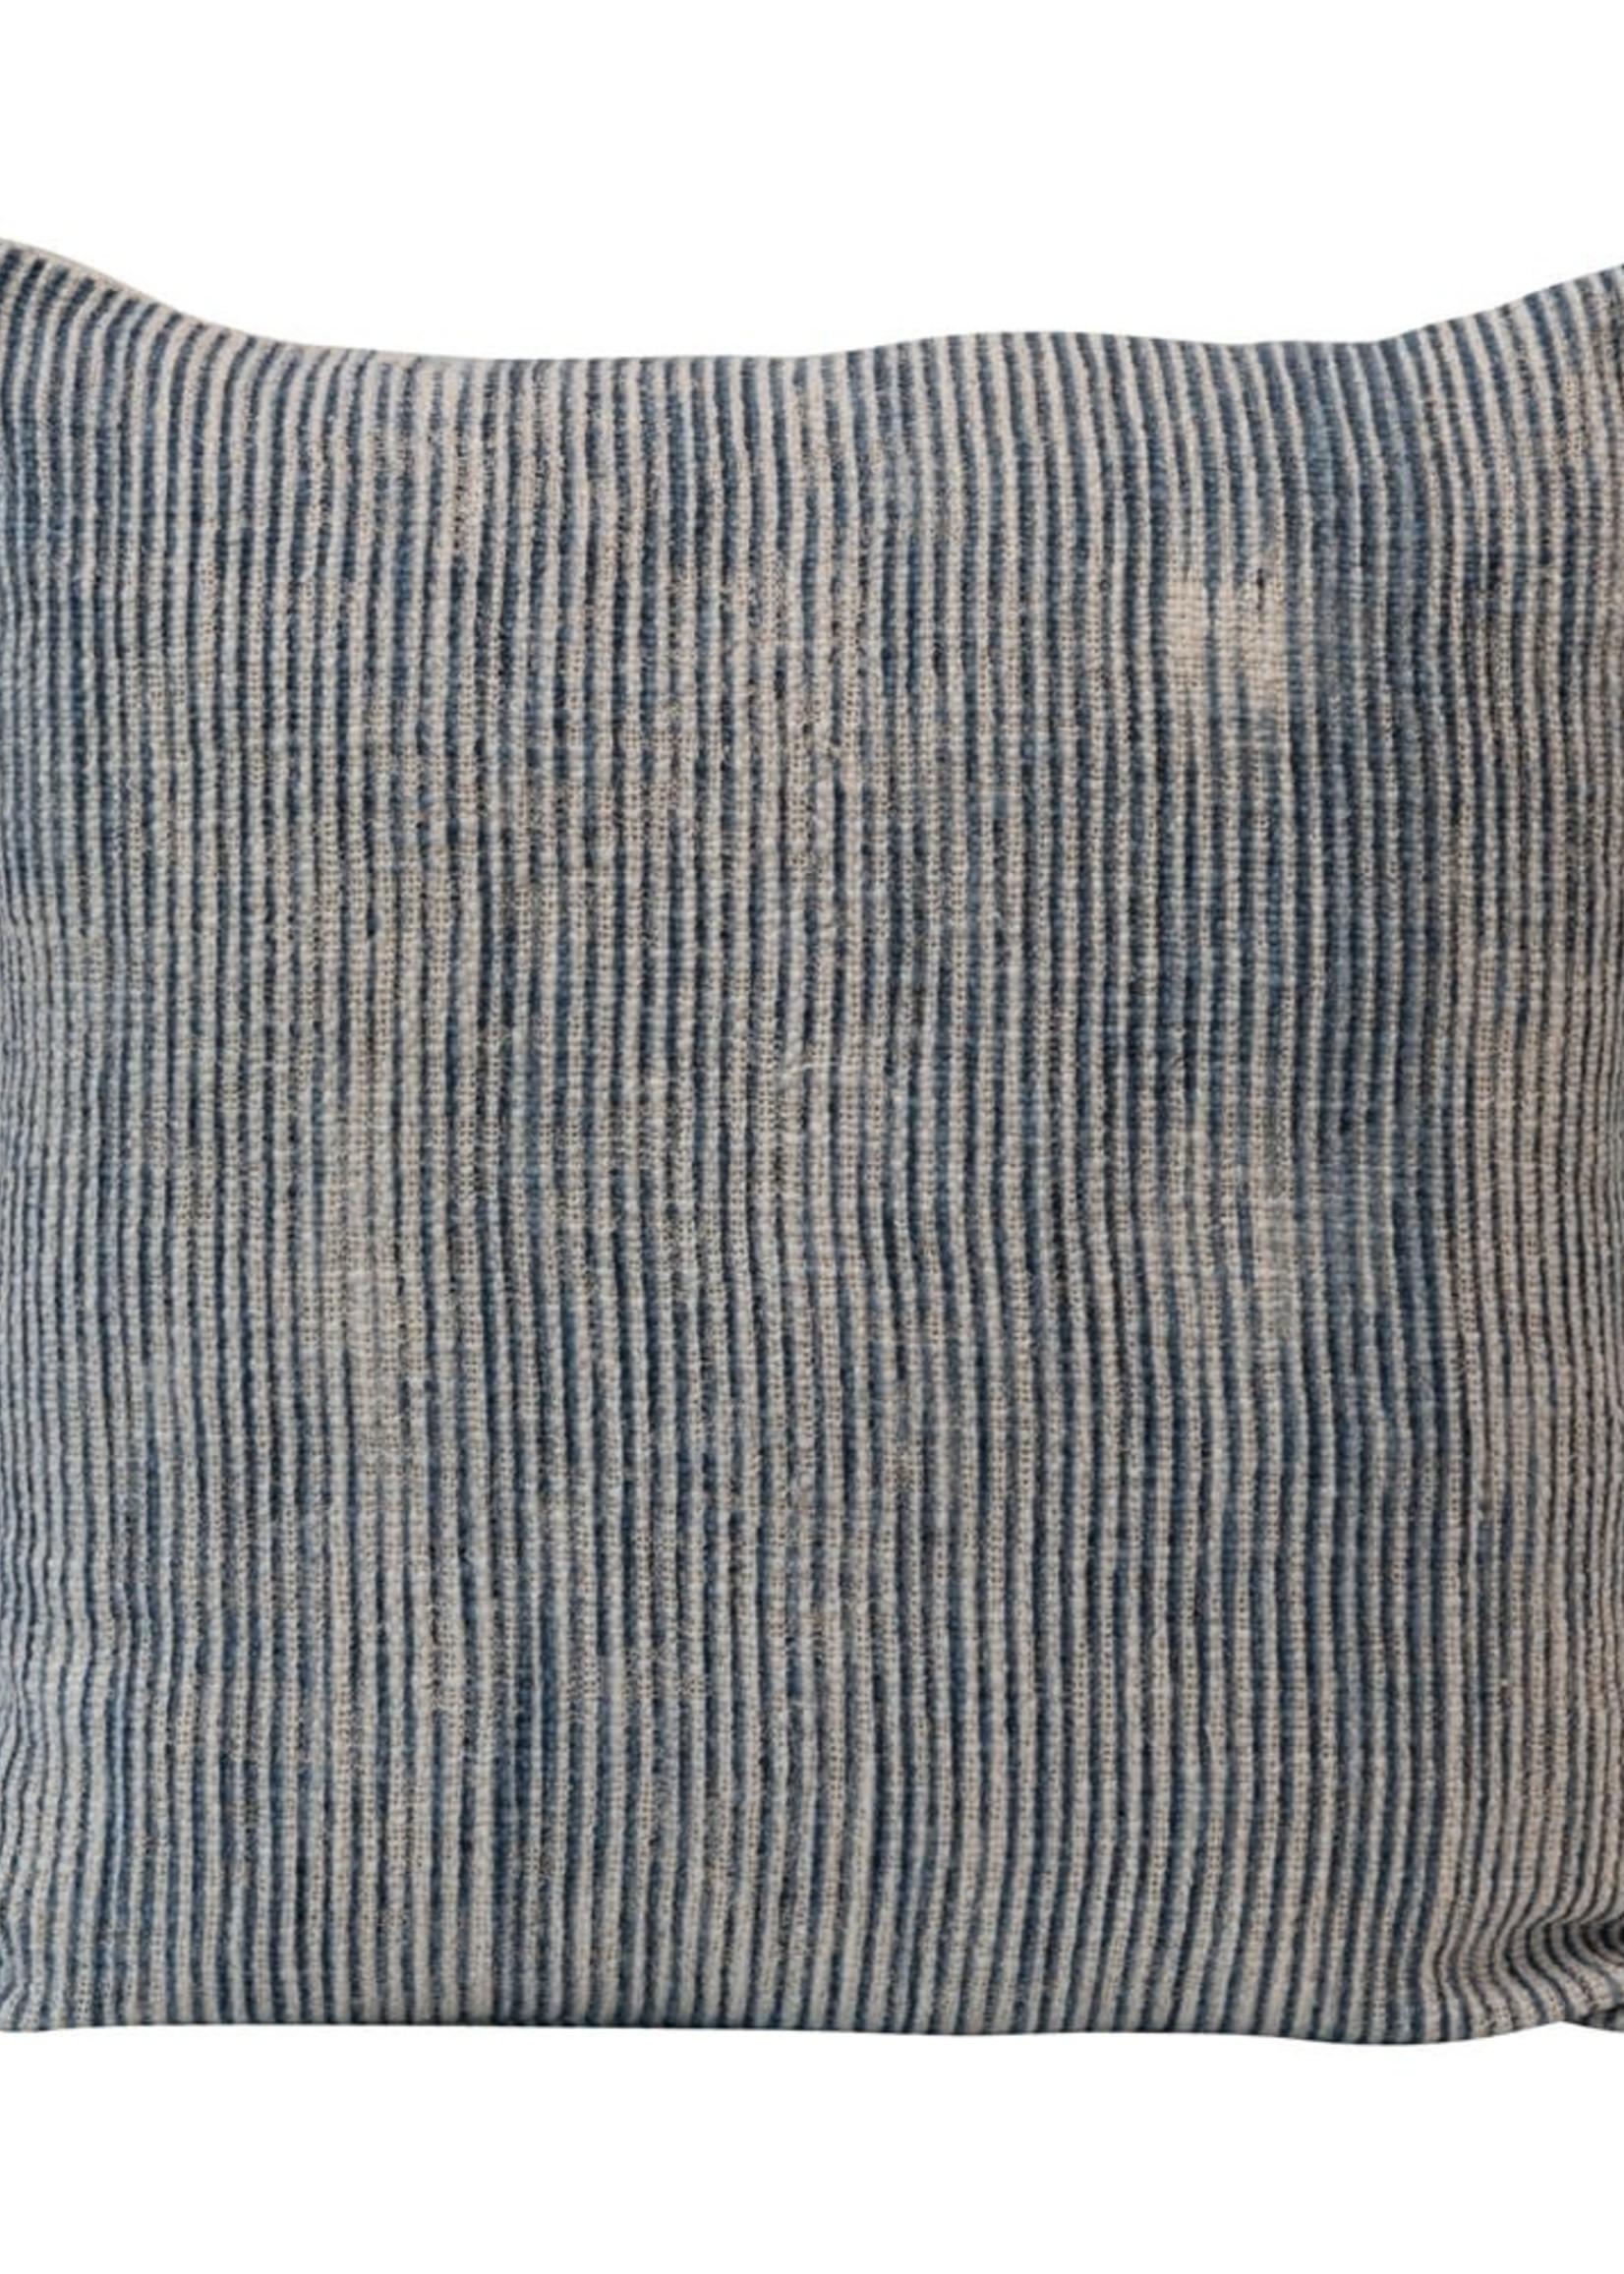 Square Stonewashed Woven Cotton Blend Slub Pillow w/ Stripes, Blue & Cream Color